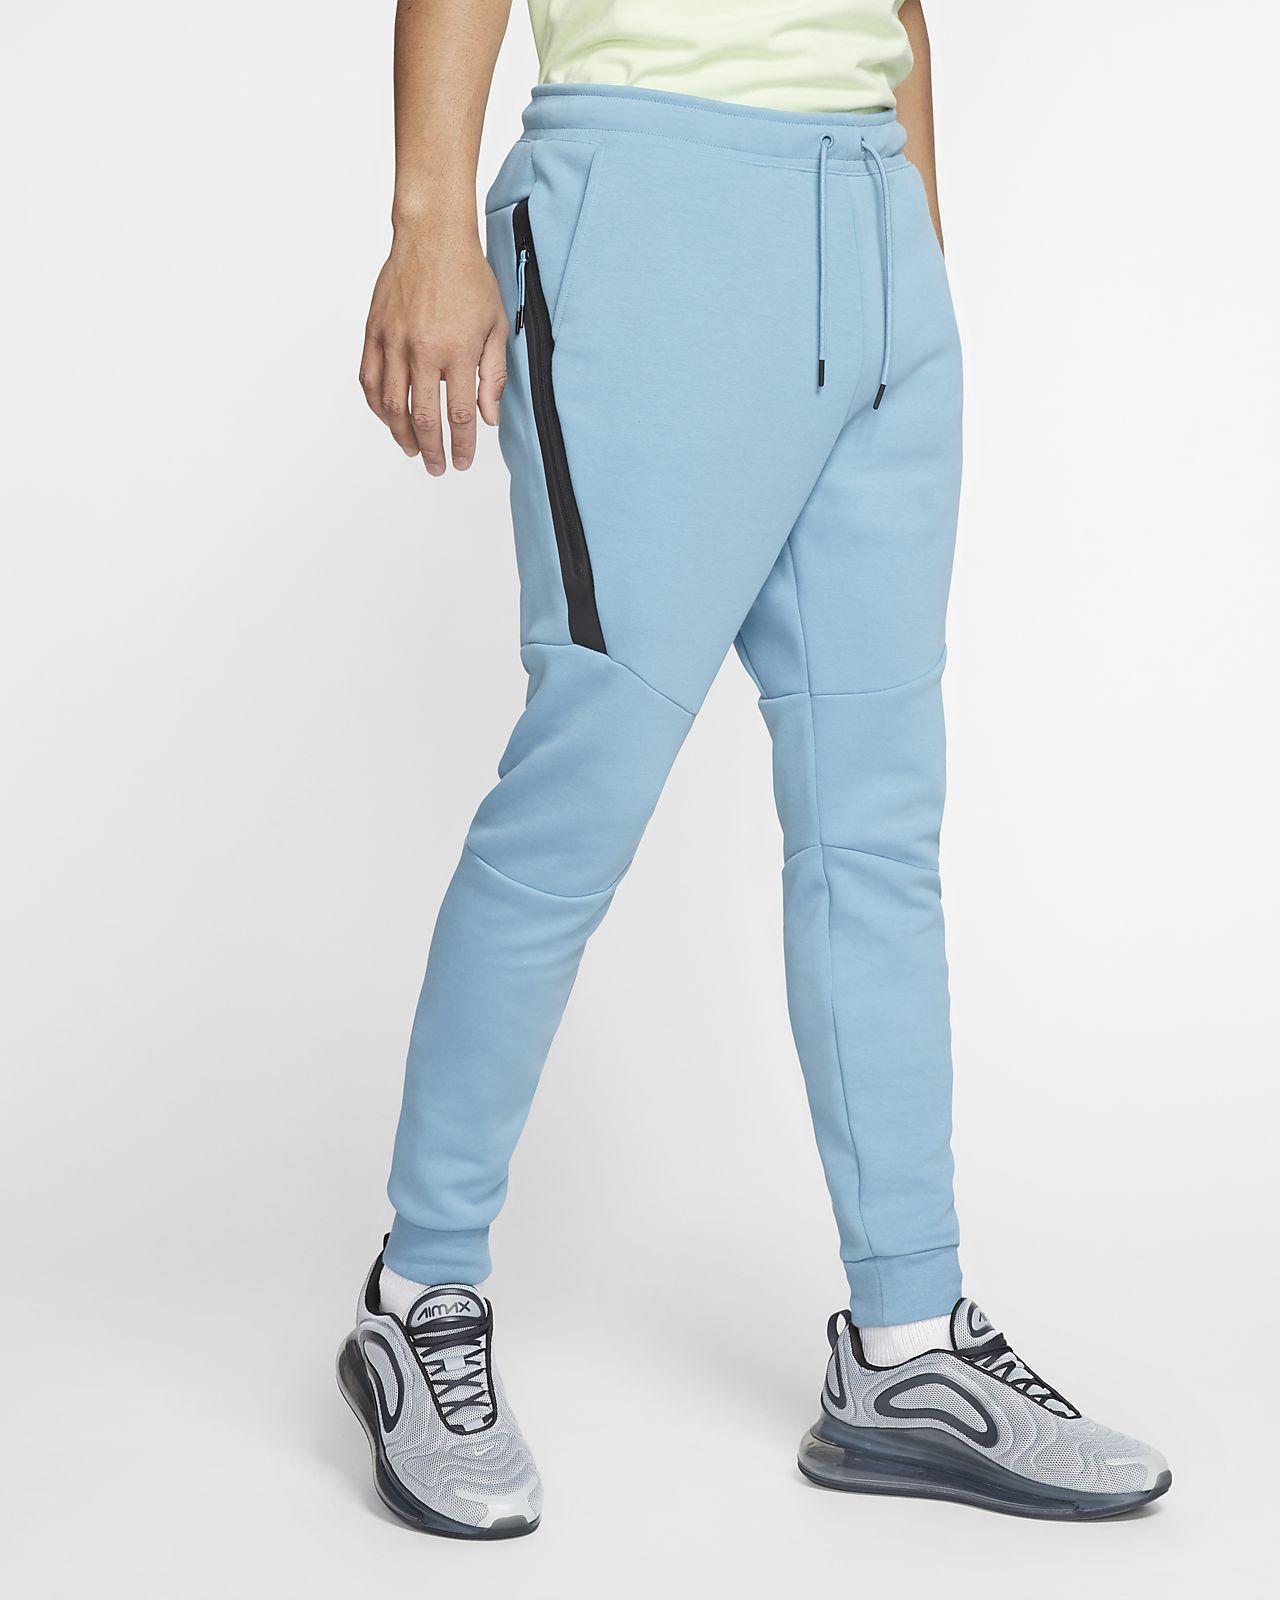 Pantalones Deportivos Hombre Nike Coupon For Fb4f9 Edd46